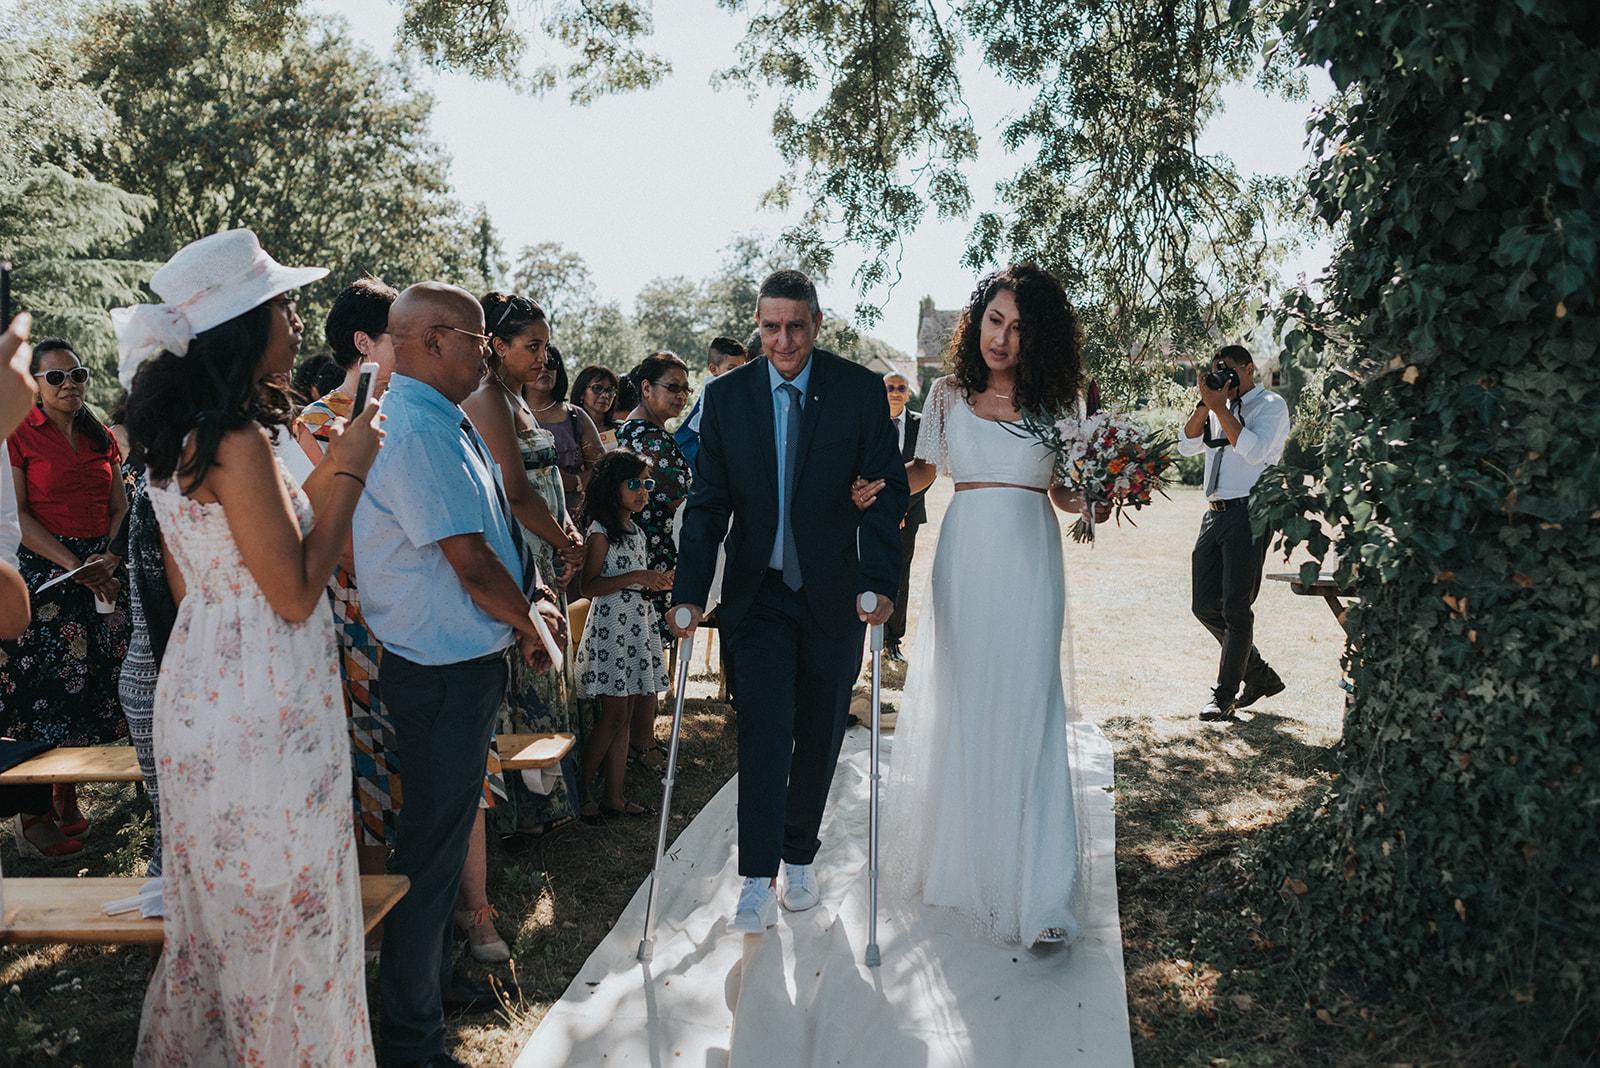 Mariage de Teddy et Arielle-189.jpg